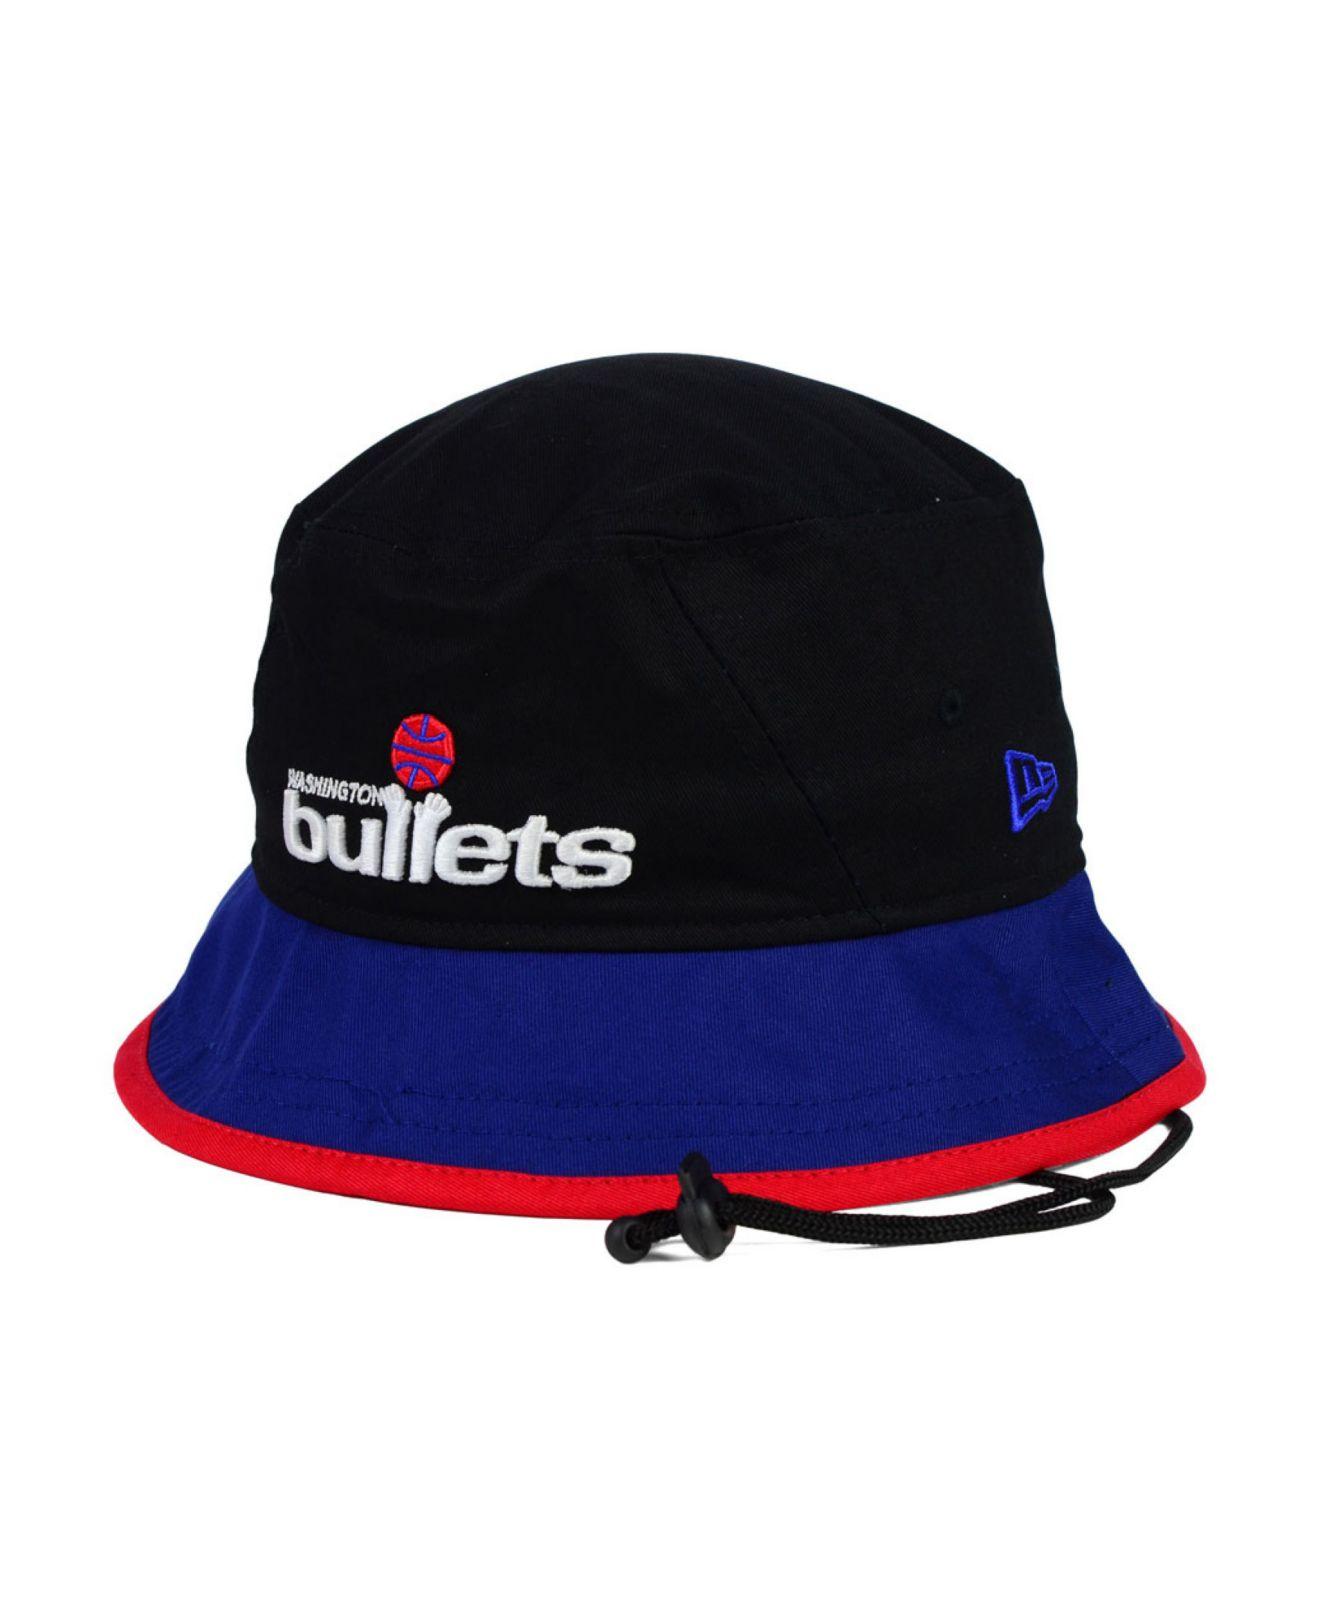 Lyst - KTZ Washington Bullets Black-Top Bucket Hat in Black for Men 54f03b108cdb